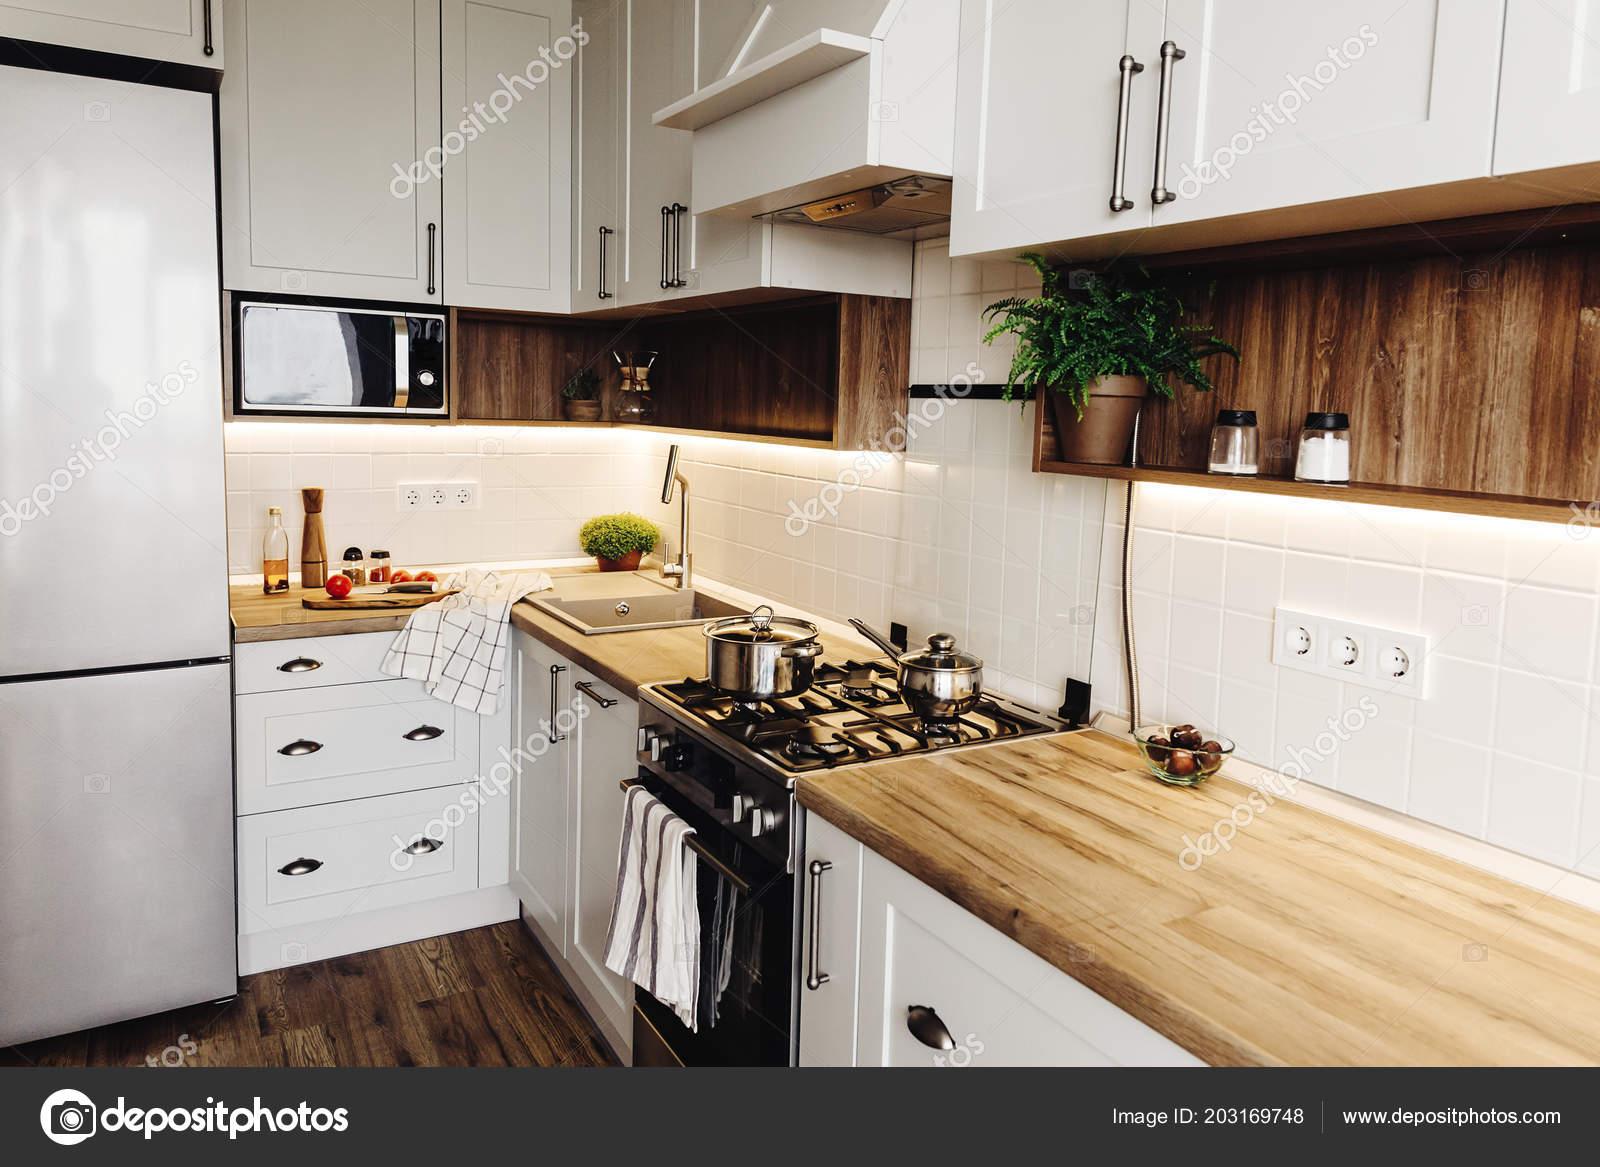 Cottura Cucina Moderna Stile Scandinavo Interiore Elegante ...